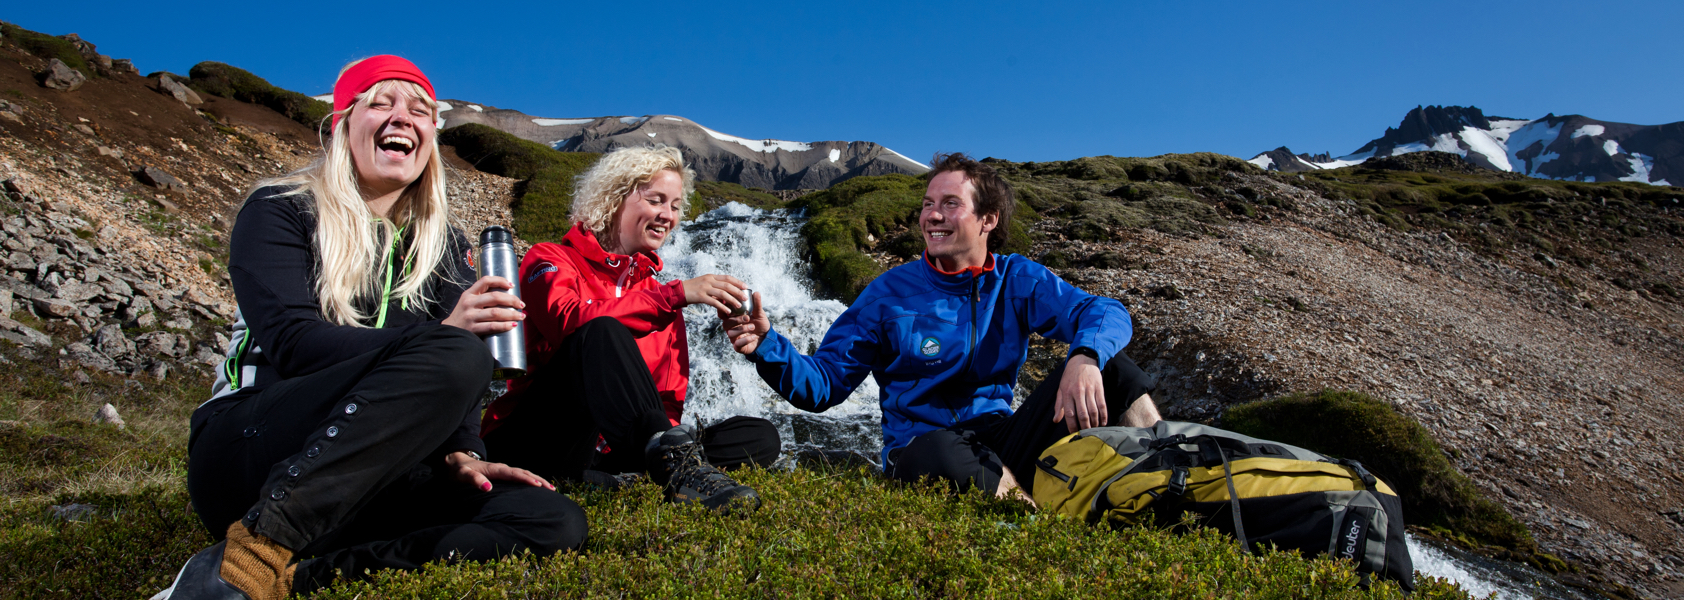 IJsland | Wandelreis Oost IJsland & Thorsmörk